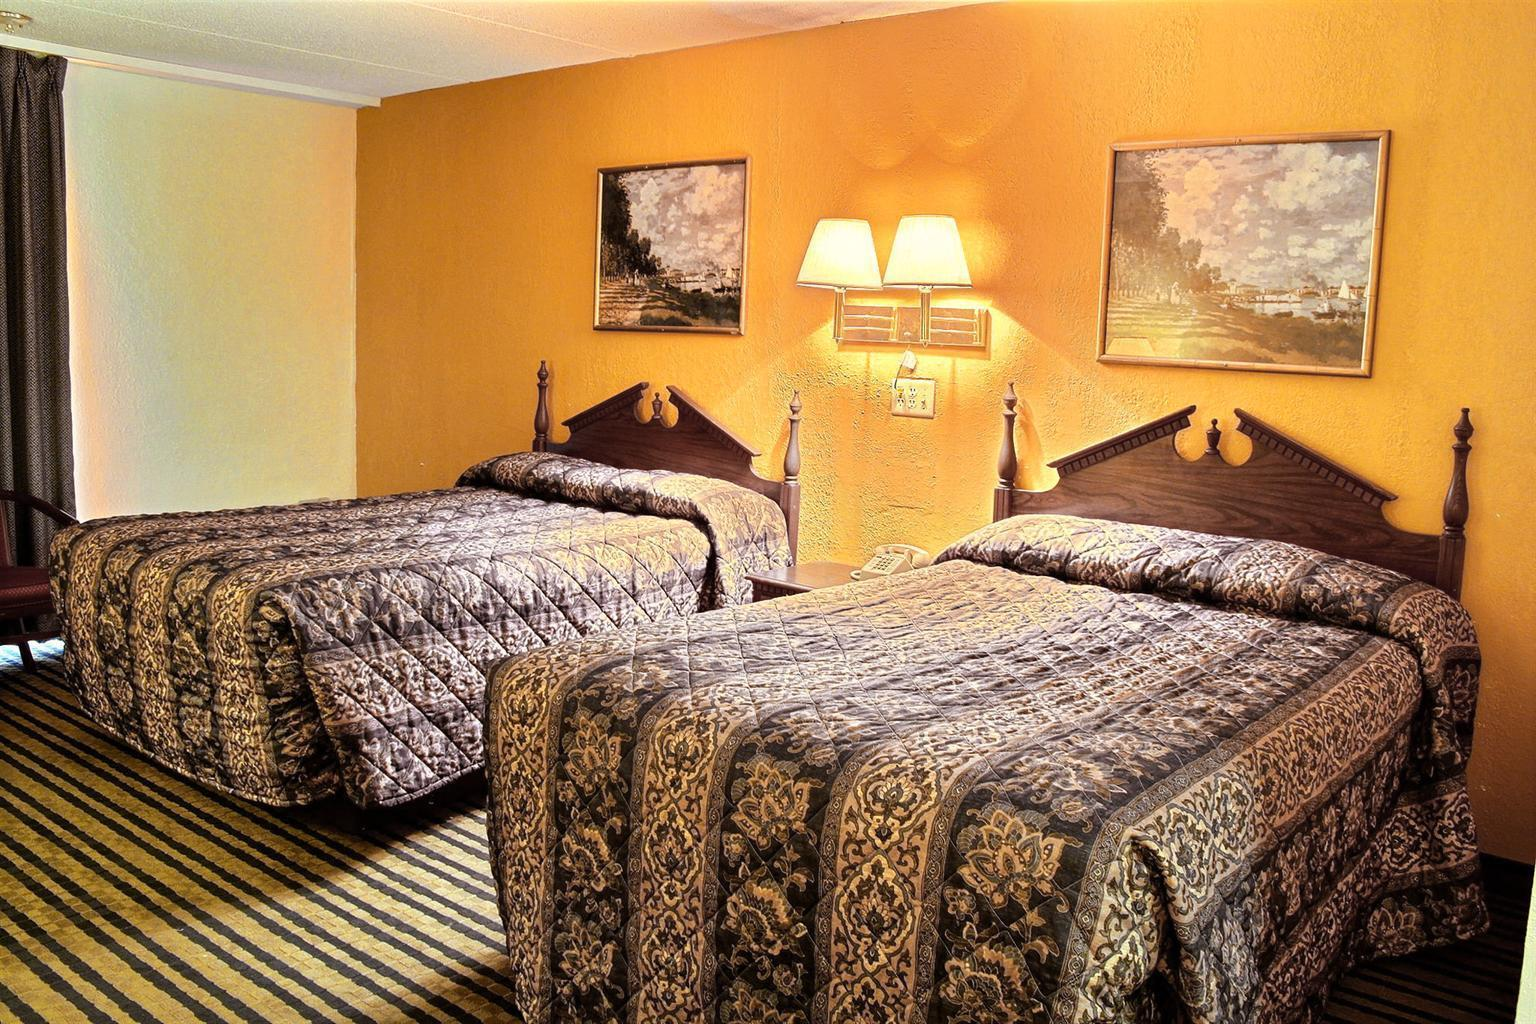 Americas Best Value Inn Niagara Falls Motel (Niagara Falls (NY)) - Deals, Photos & Reviews